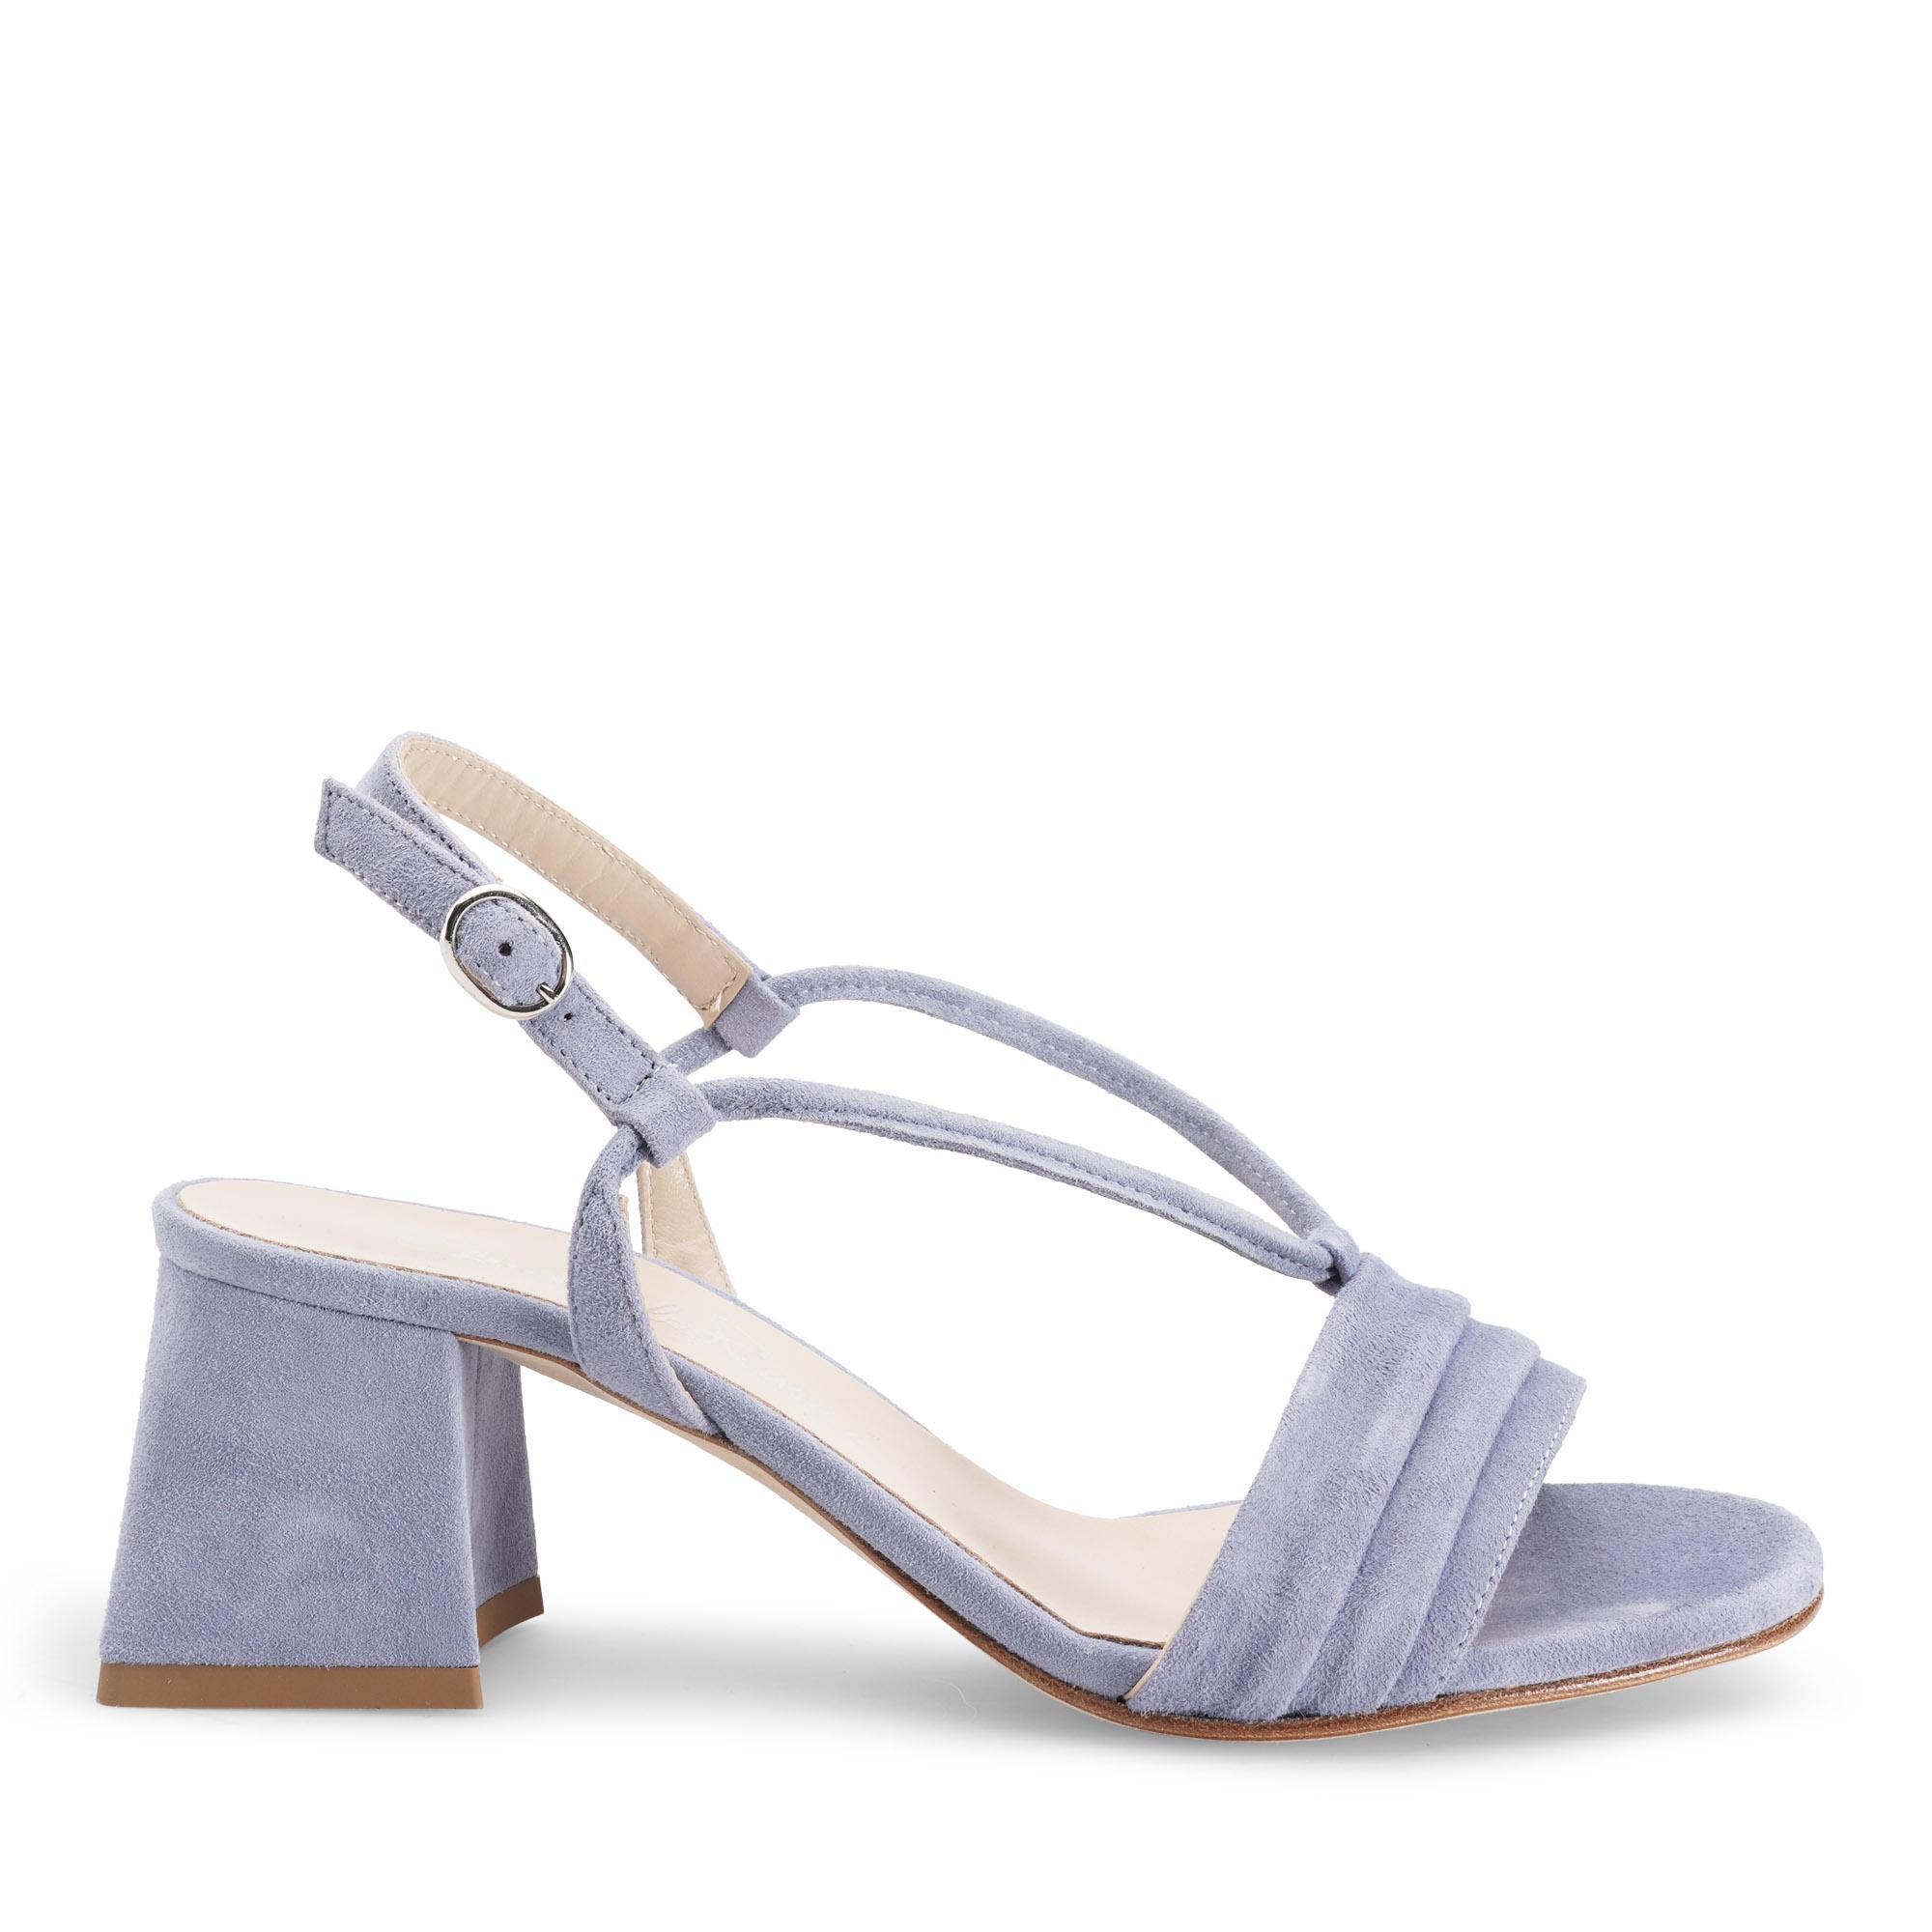 camoscio-avio-celeste-emanuela-passeri-shoes-heels-spring-summer-2021